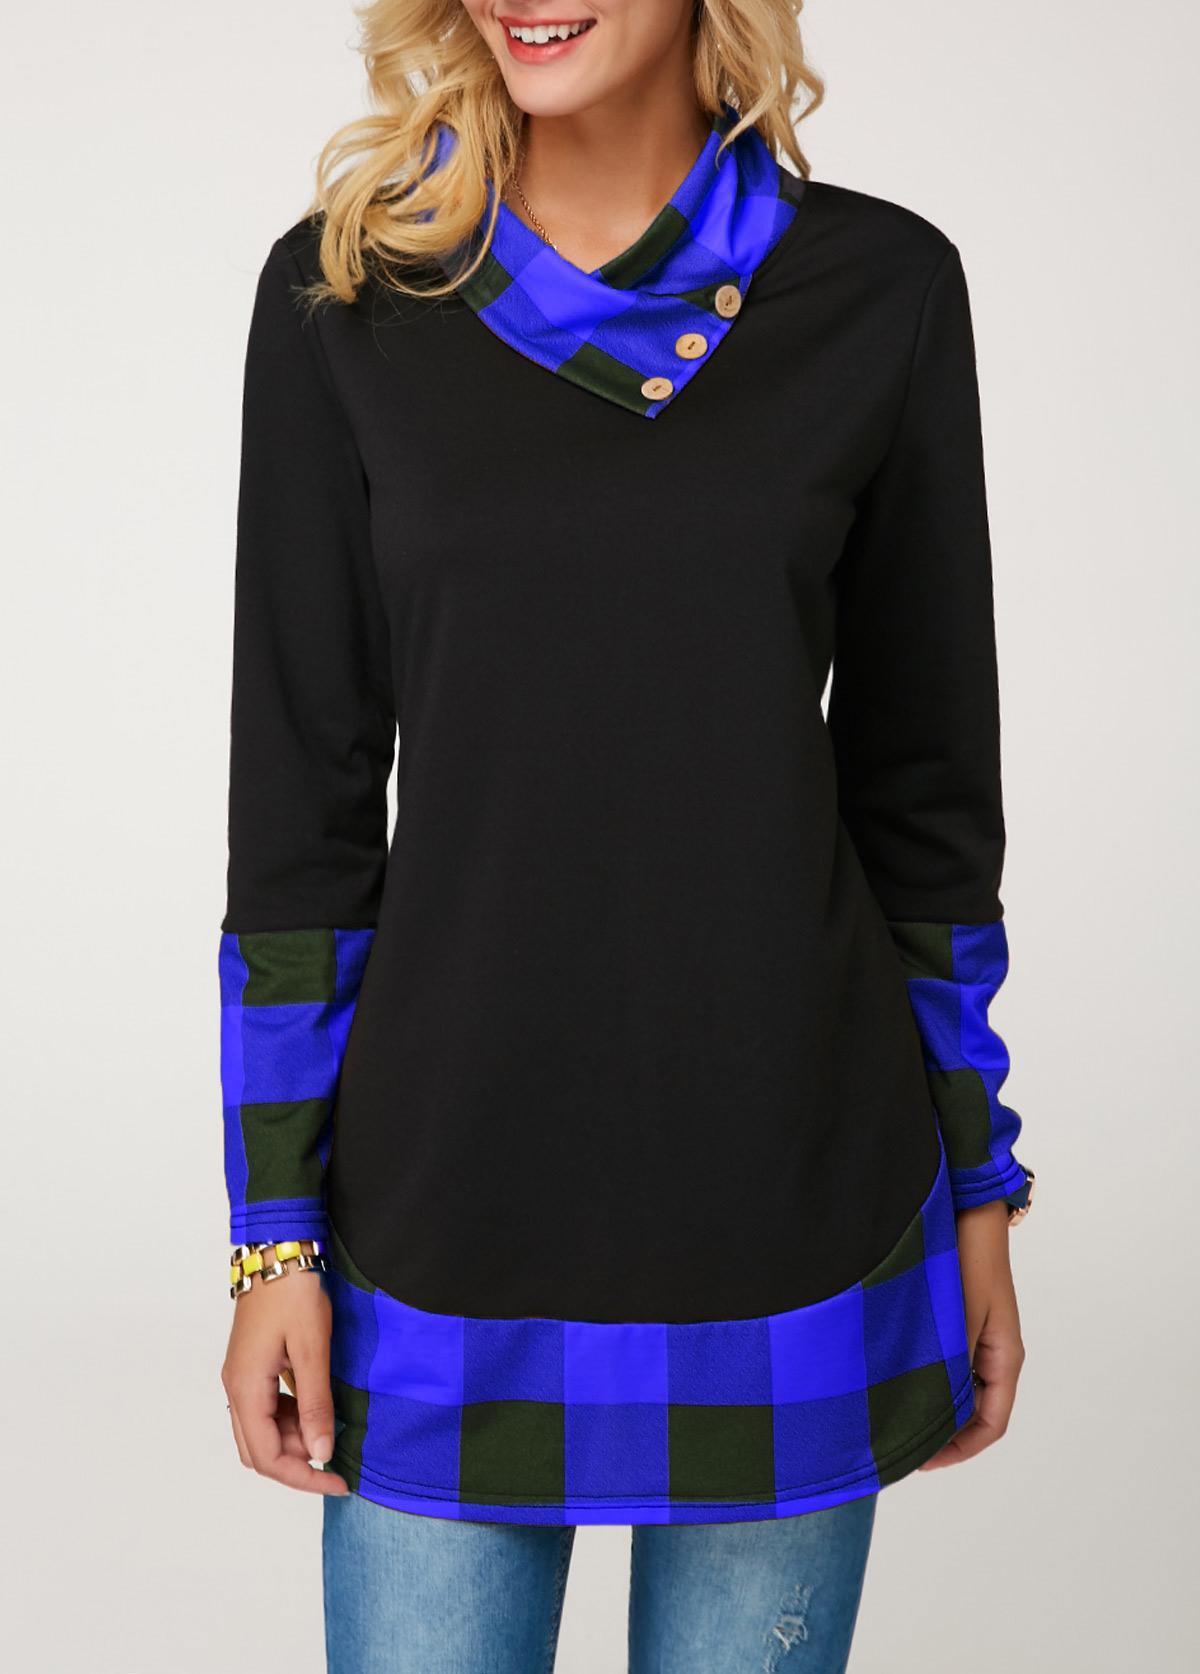 Plaid Print Long Sleeve T Shirt